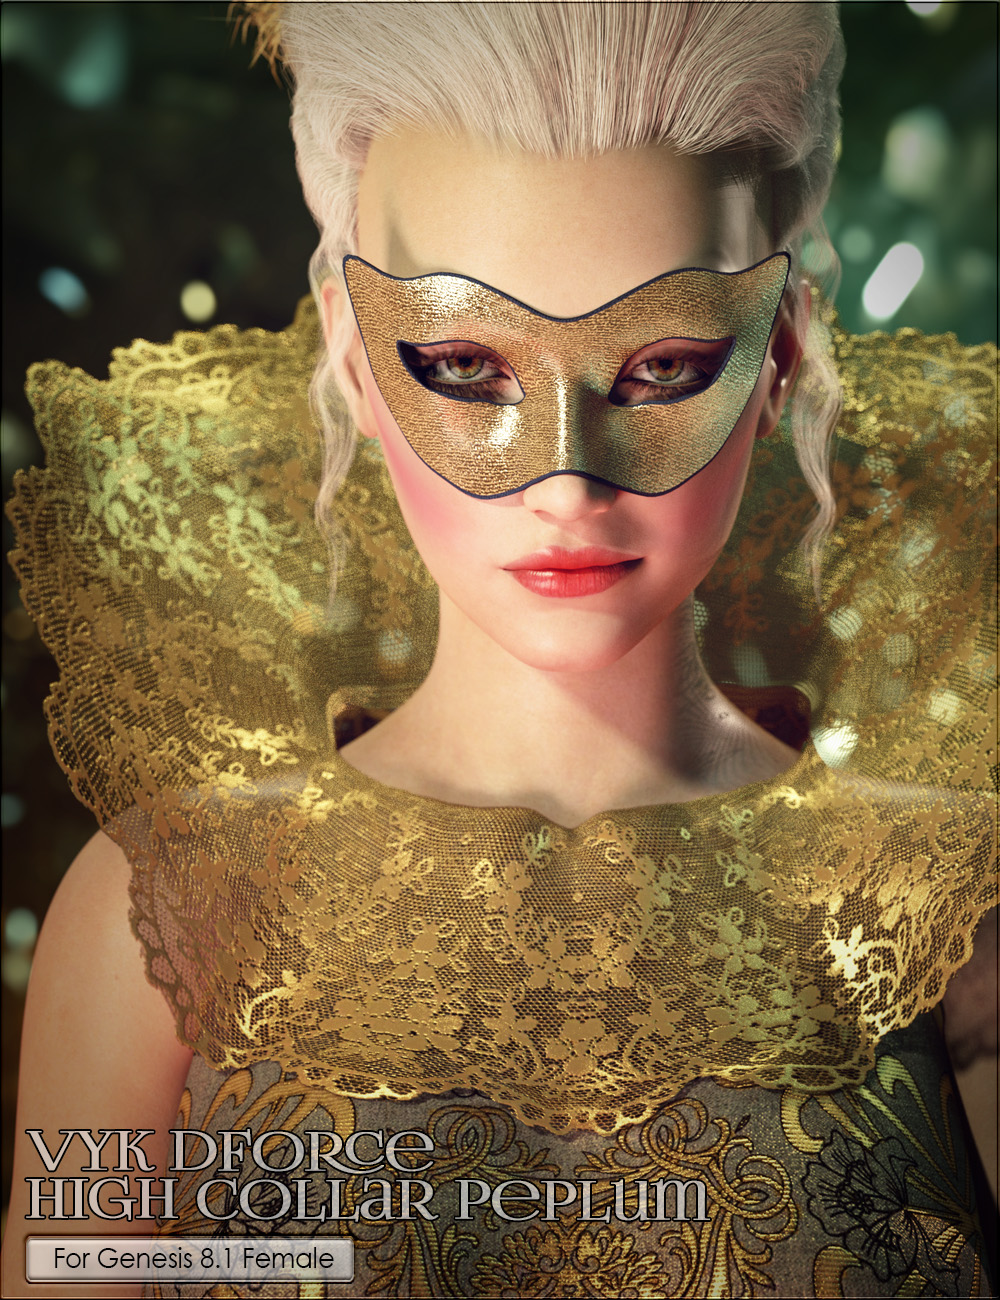 VYK dForce High Collar Peplum by: vyktohria, 3D Models by Daz 3D